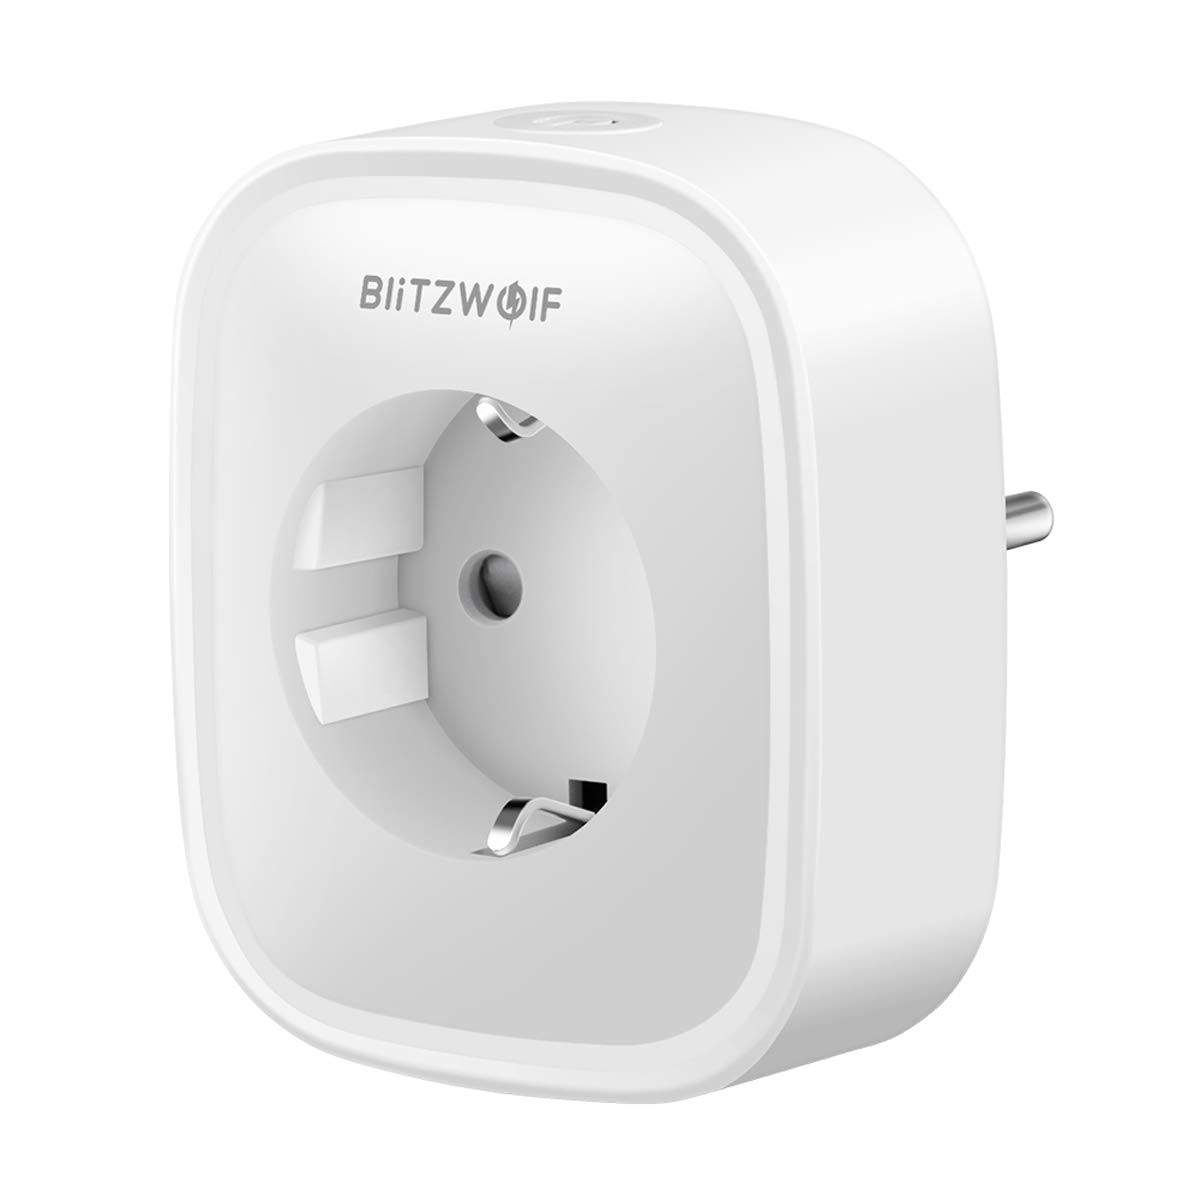 Enchufe Inteligente WiFi, Enchufe WiFi Smart Plug Funciona con Amazon Alexa Control por Voz,